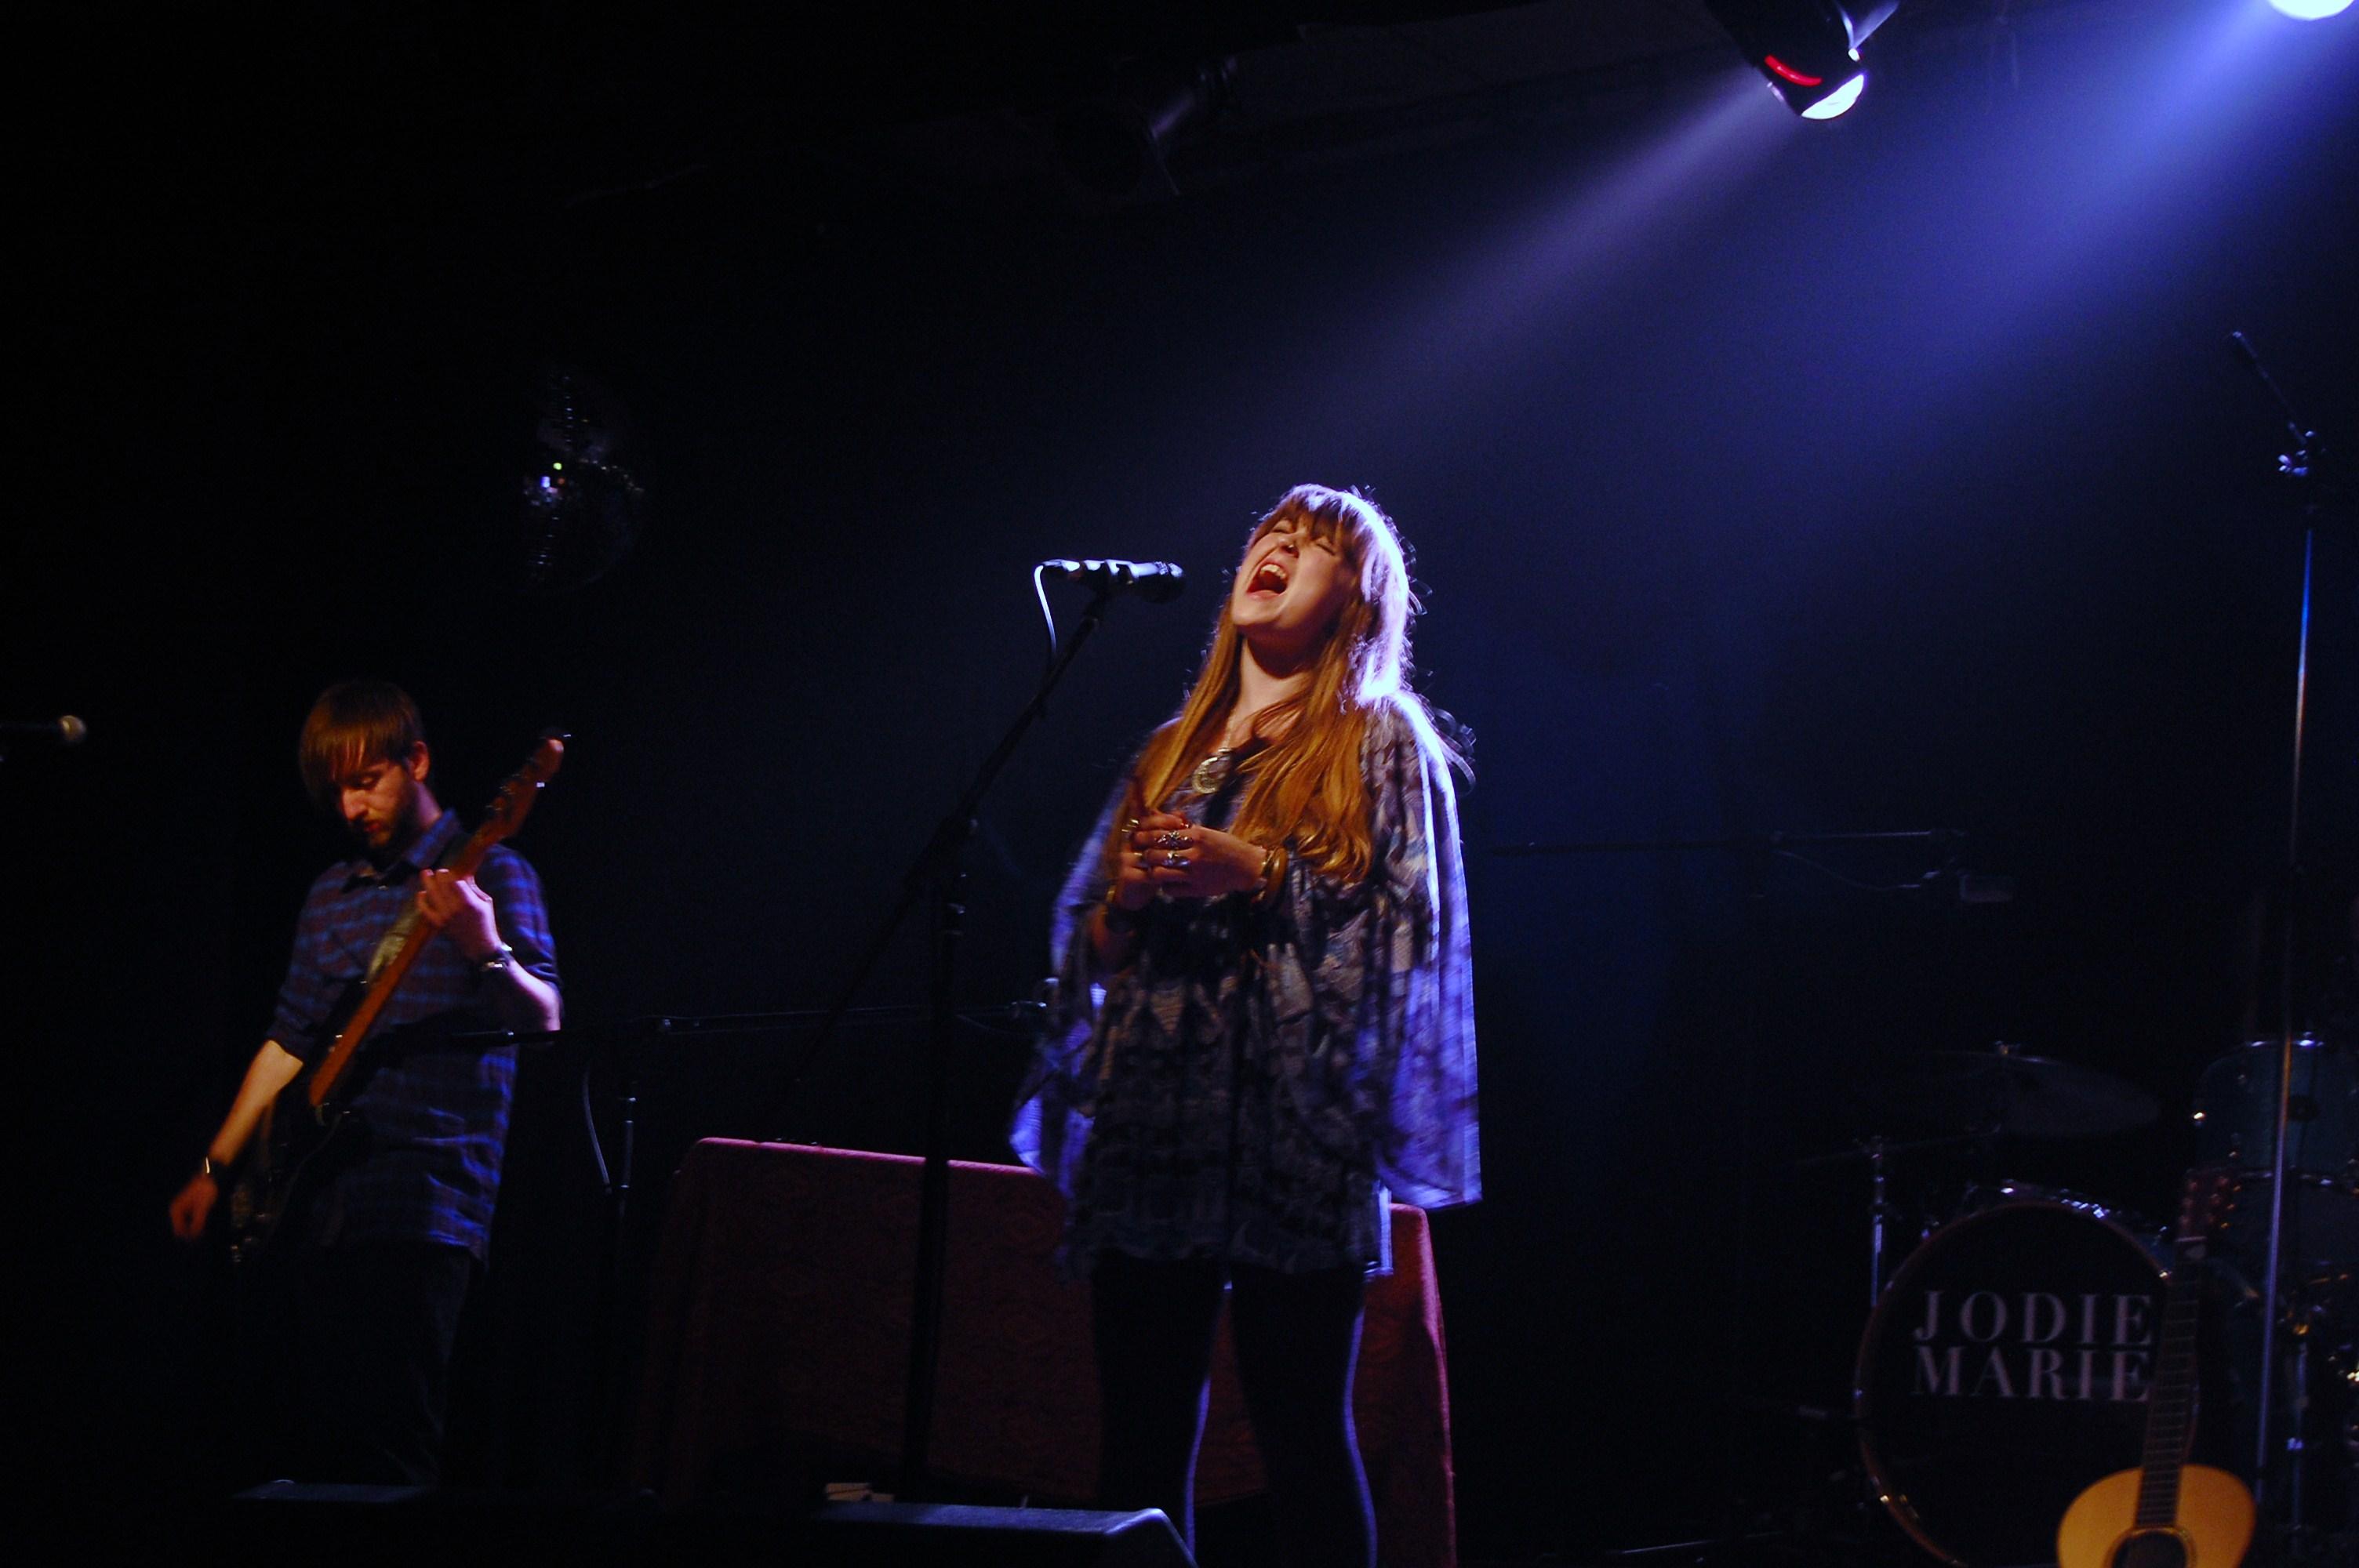 Jodie Marie 'Mountain Echo'